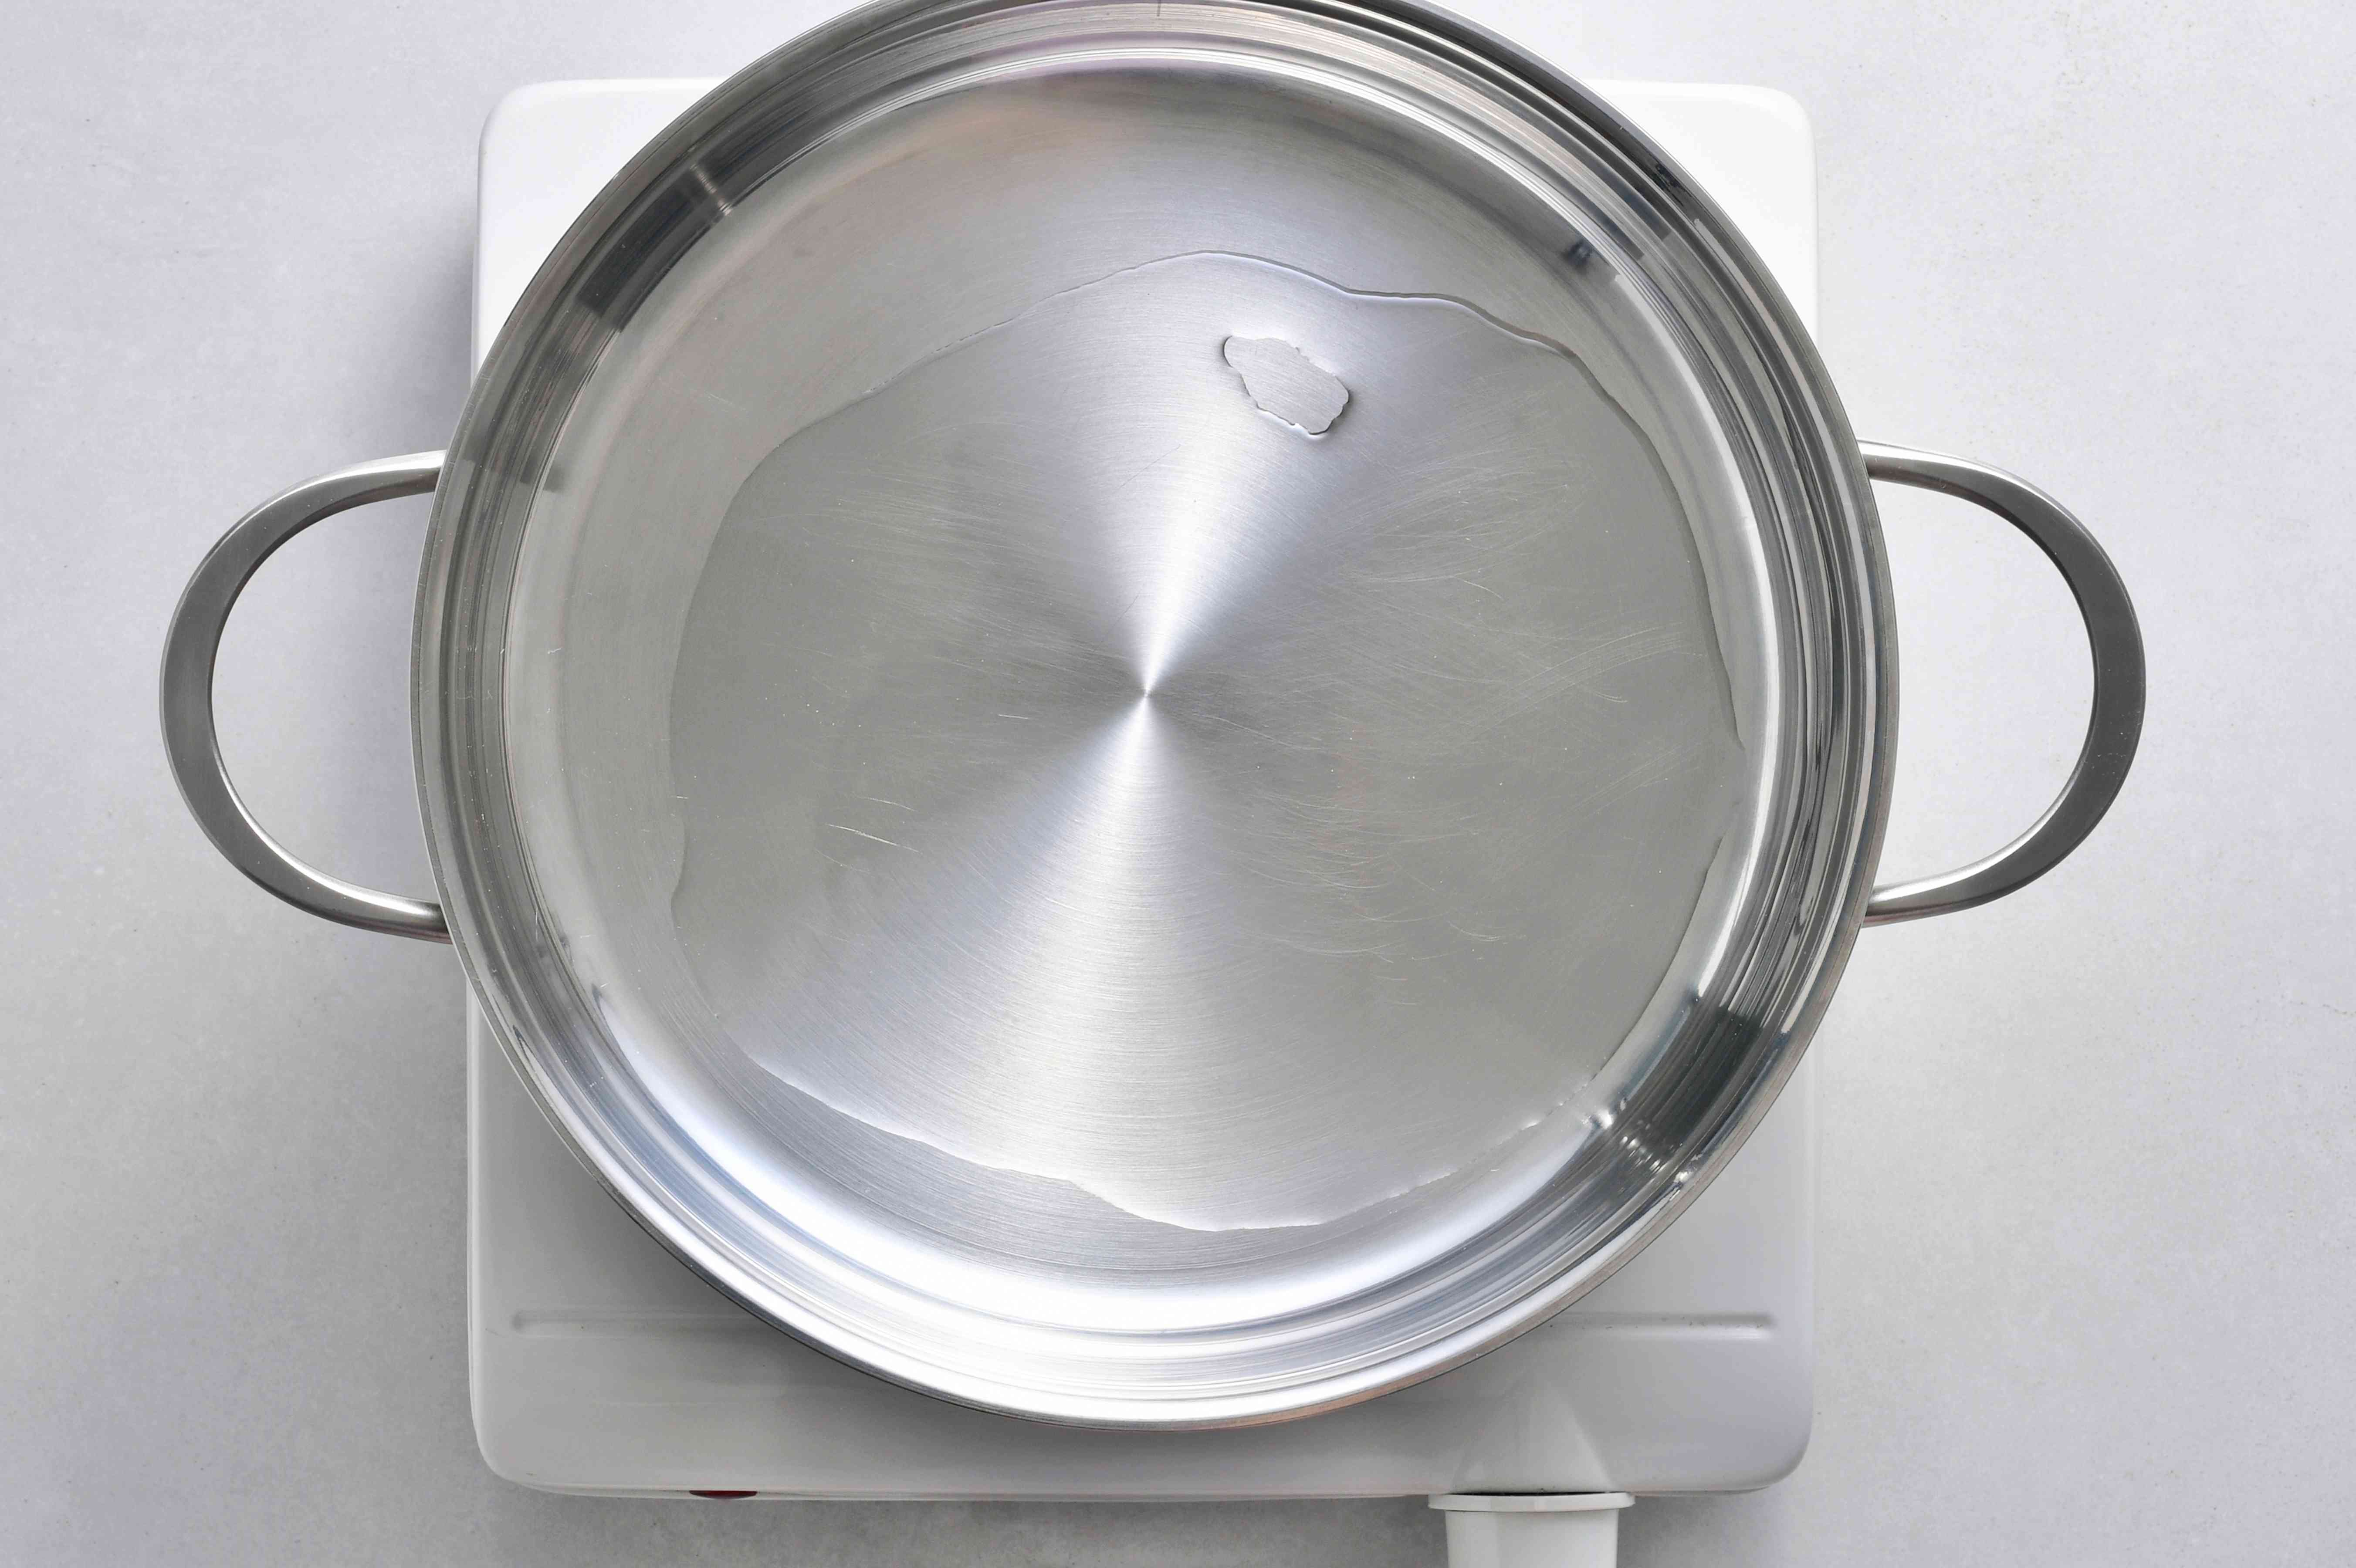 Heat vegetable oil in a pot